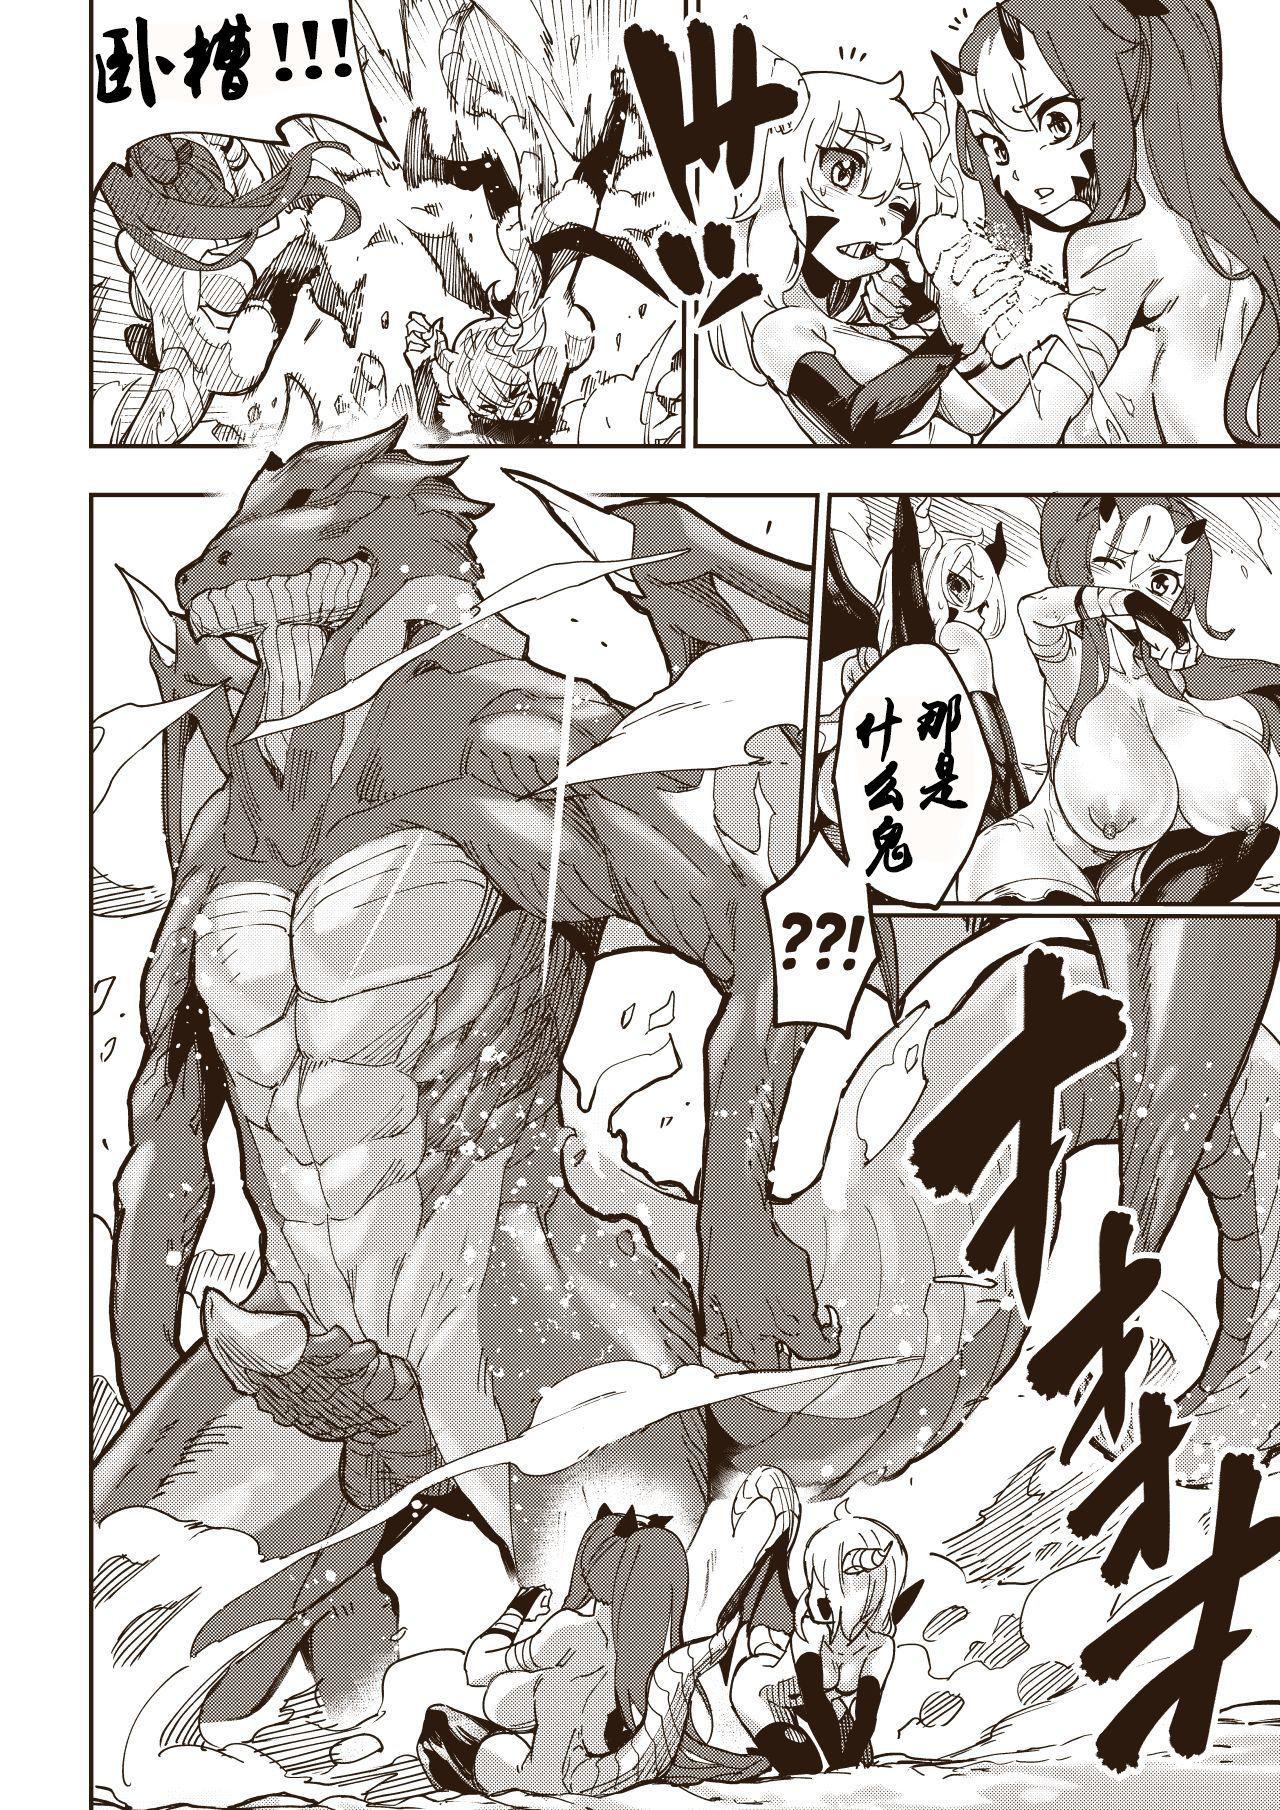 [Tamada Heijun] Ryuu no Otakara (Dragon's Treasure) Ch. 1-2 [Chinese][垃圾机翻] 17